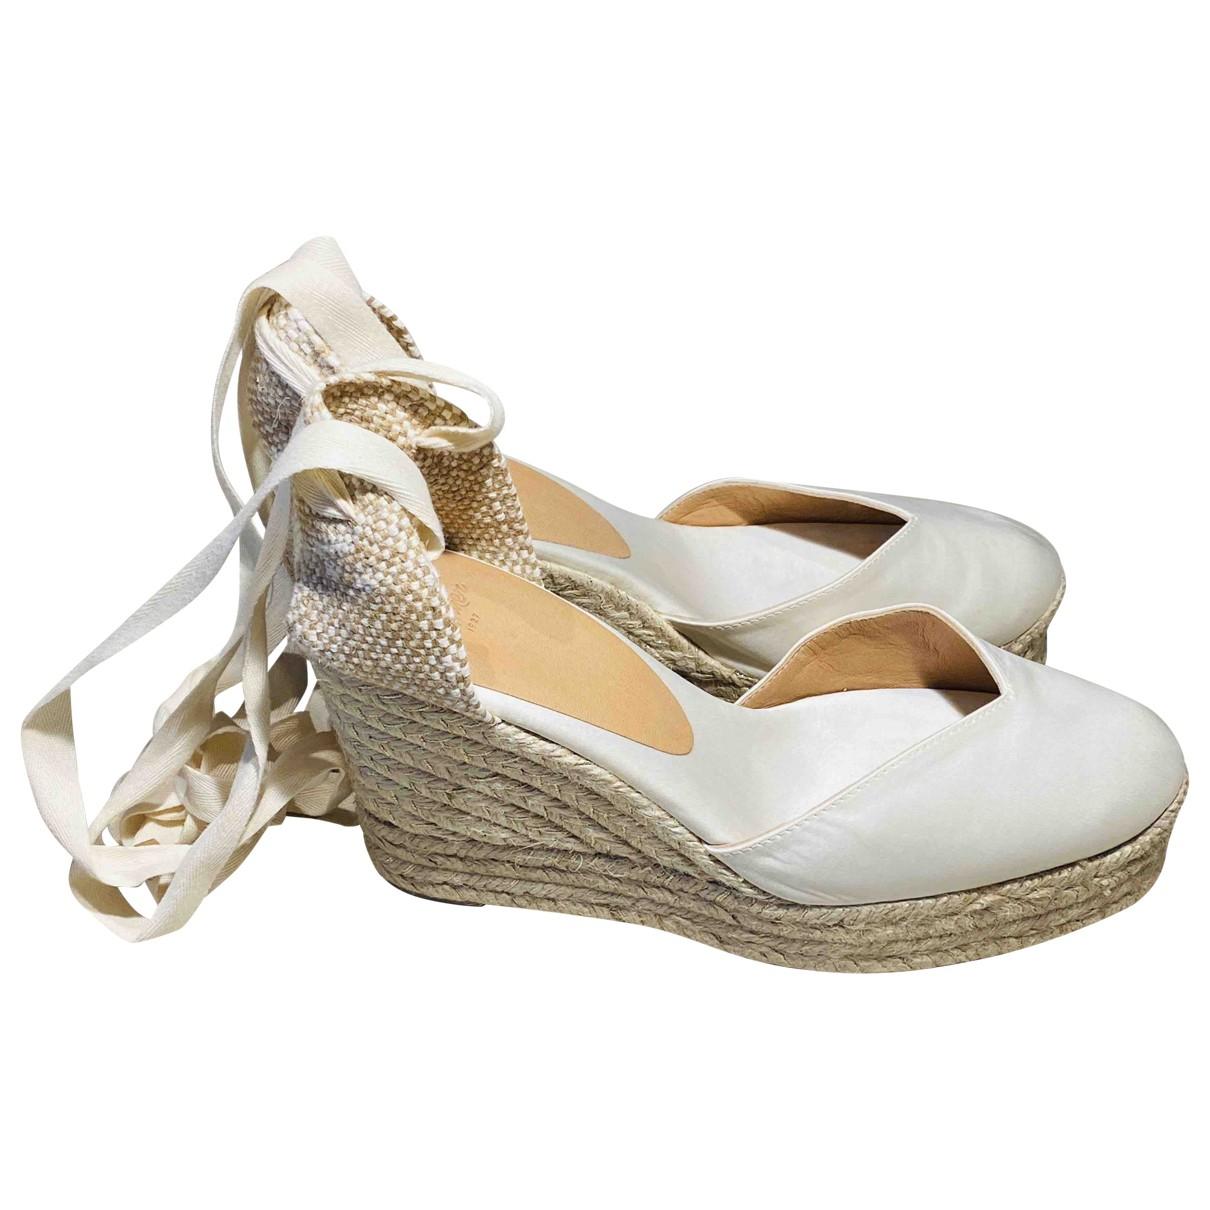 Castaner \N White Cloth Espadrilles for Women 39 EU